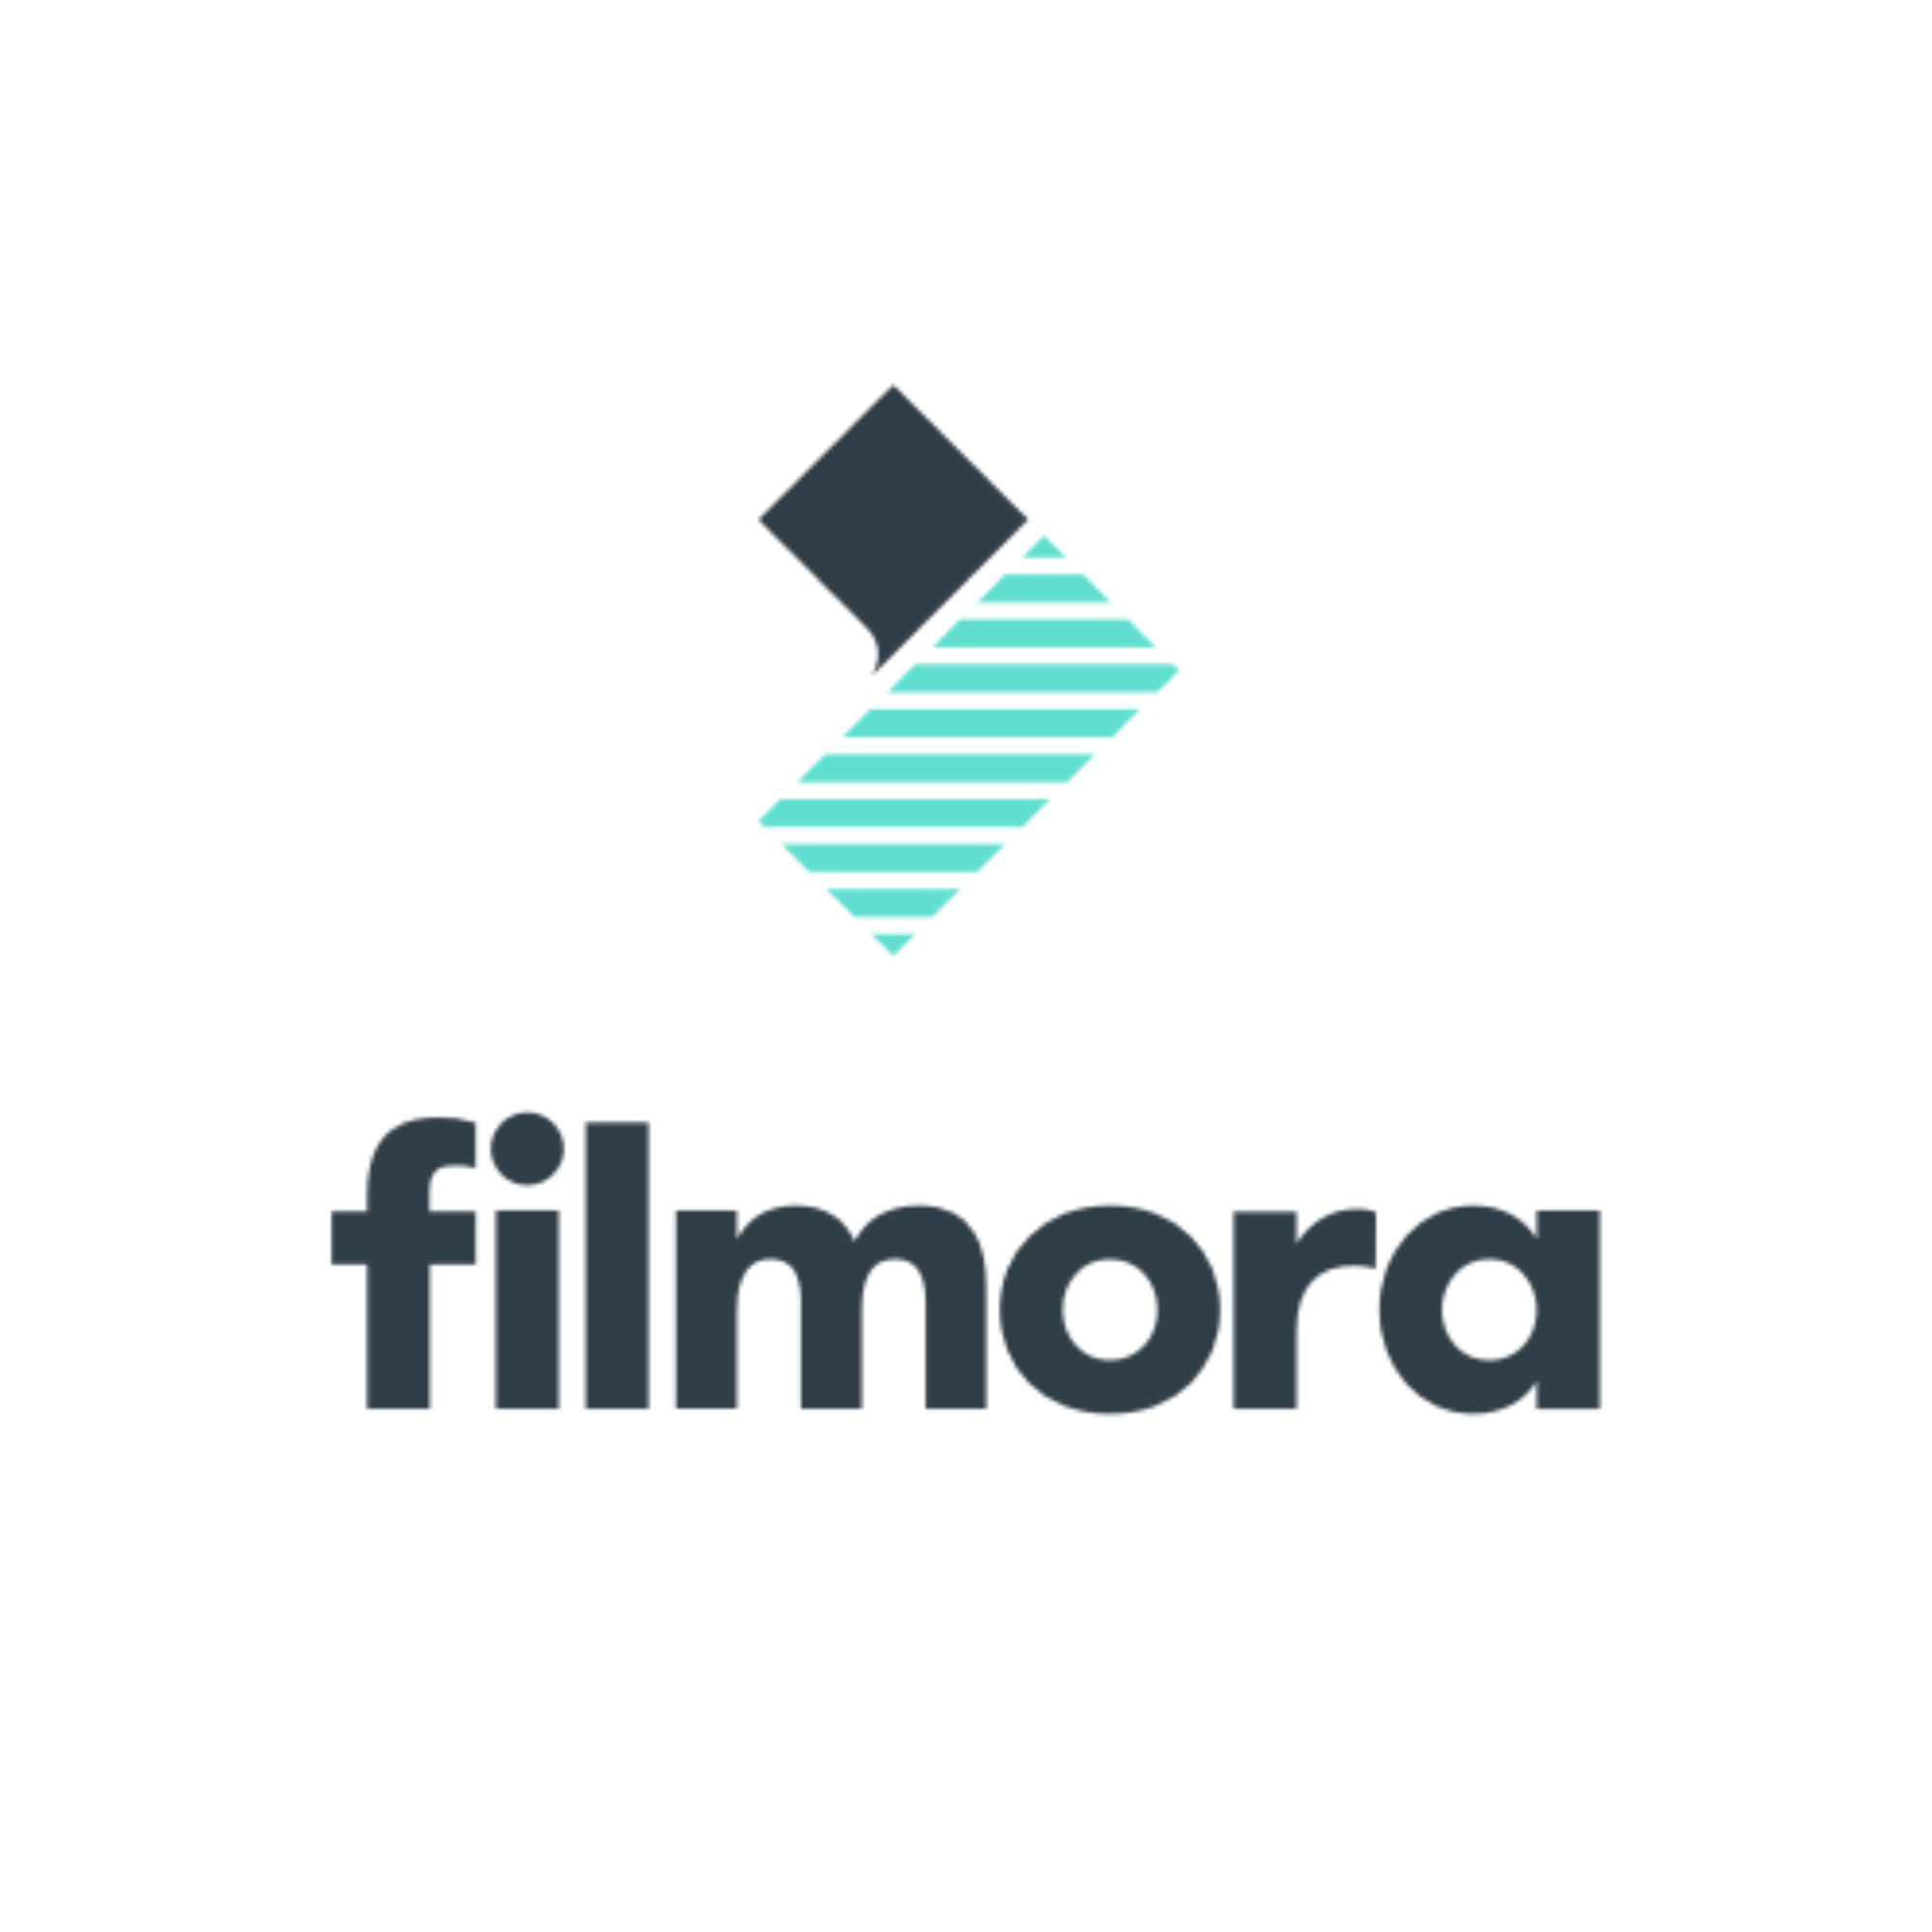 filmora logiciel montage vidéo